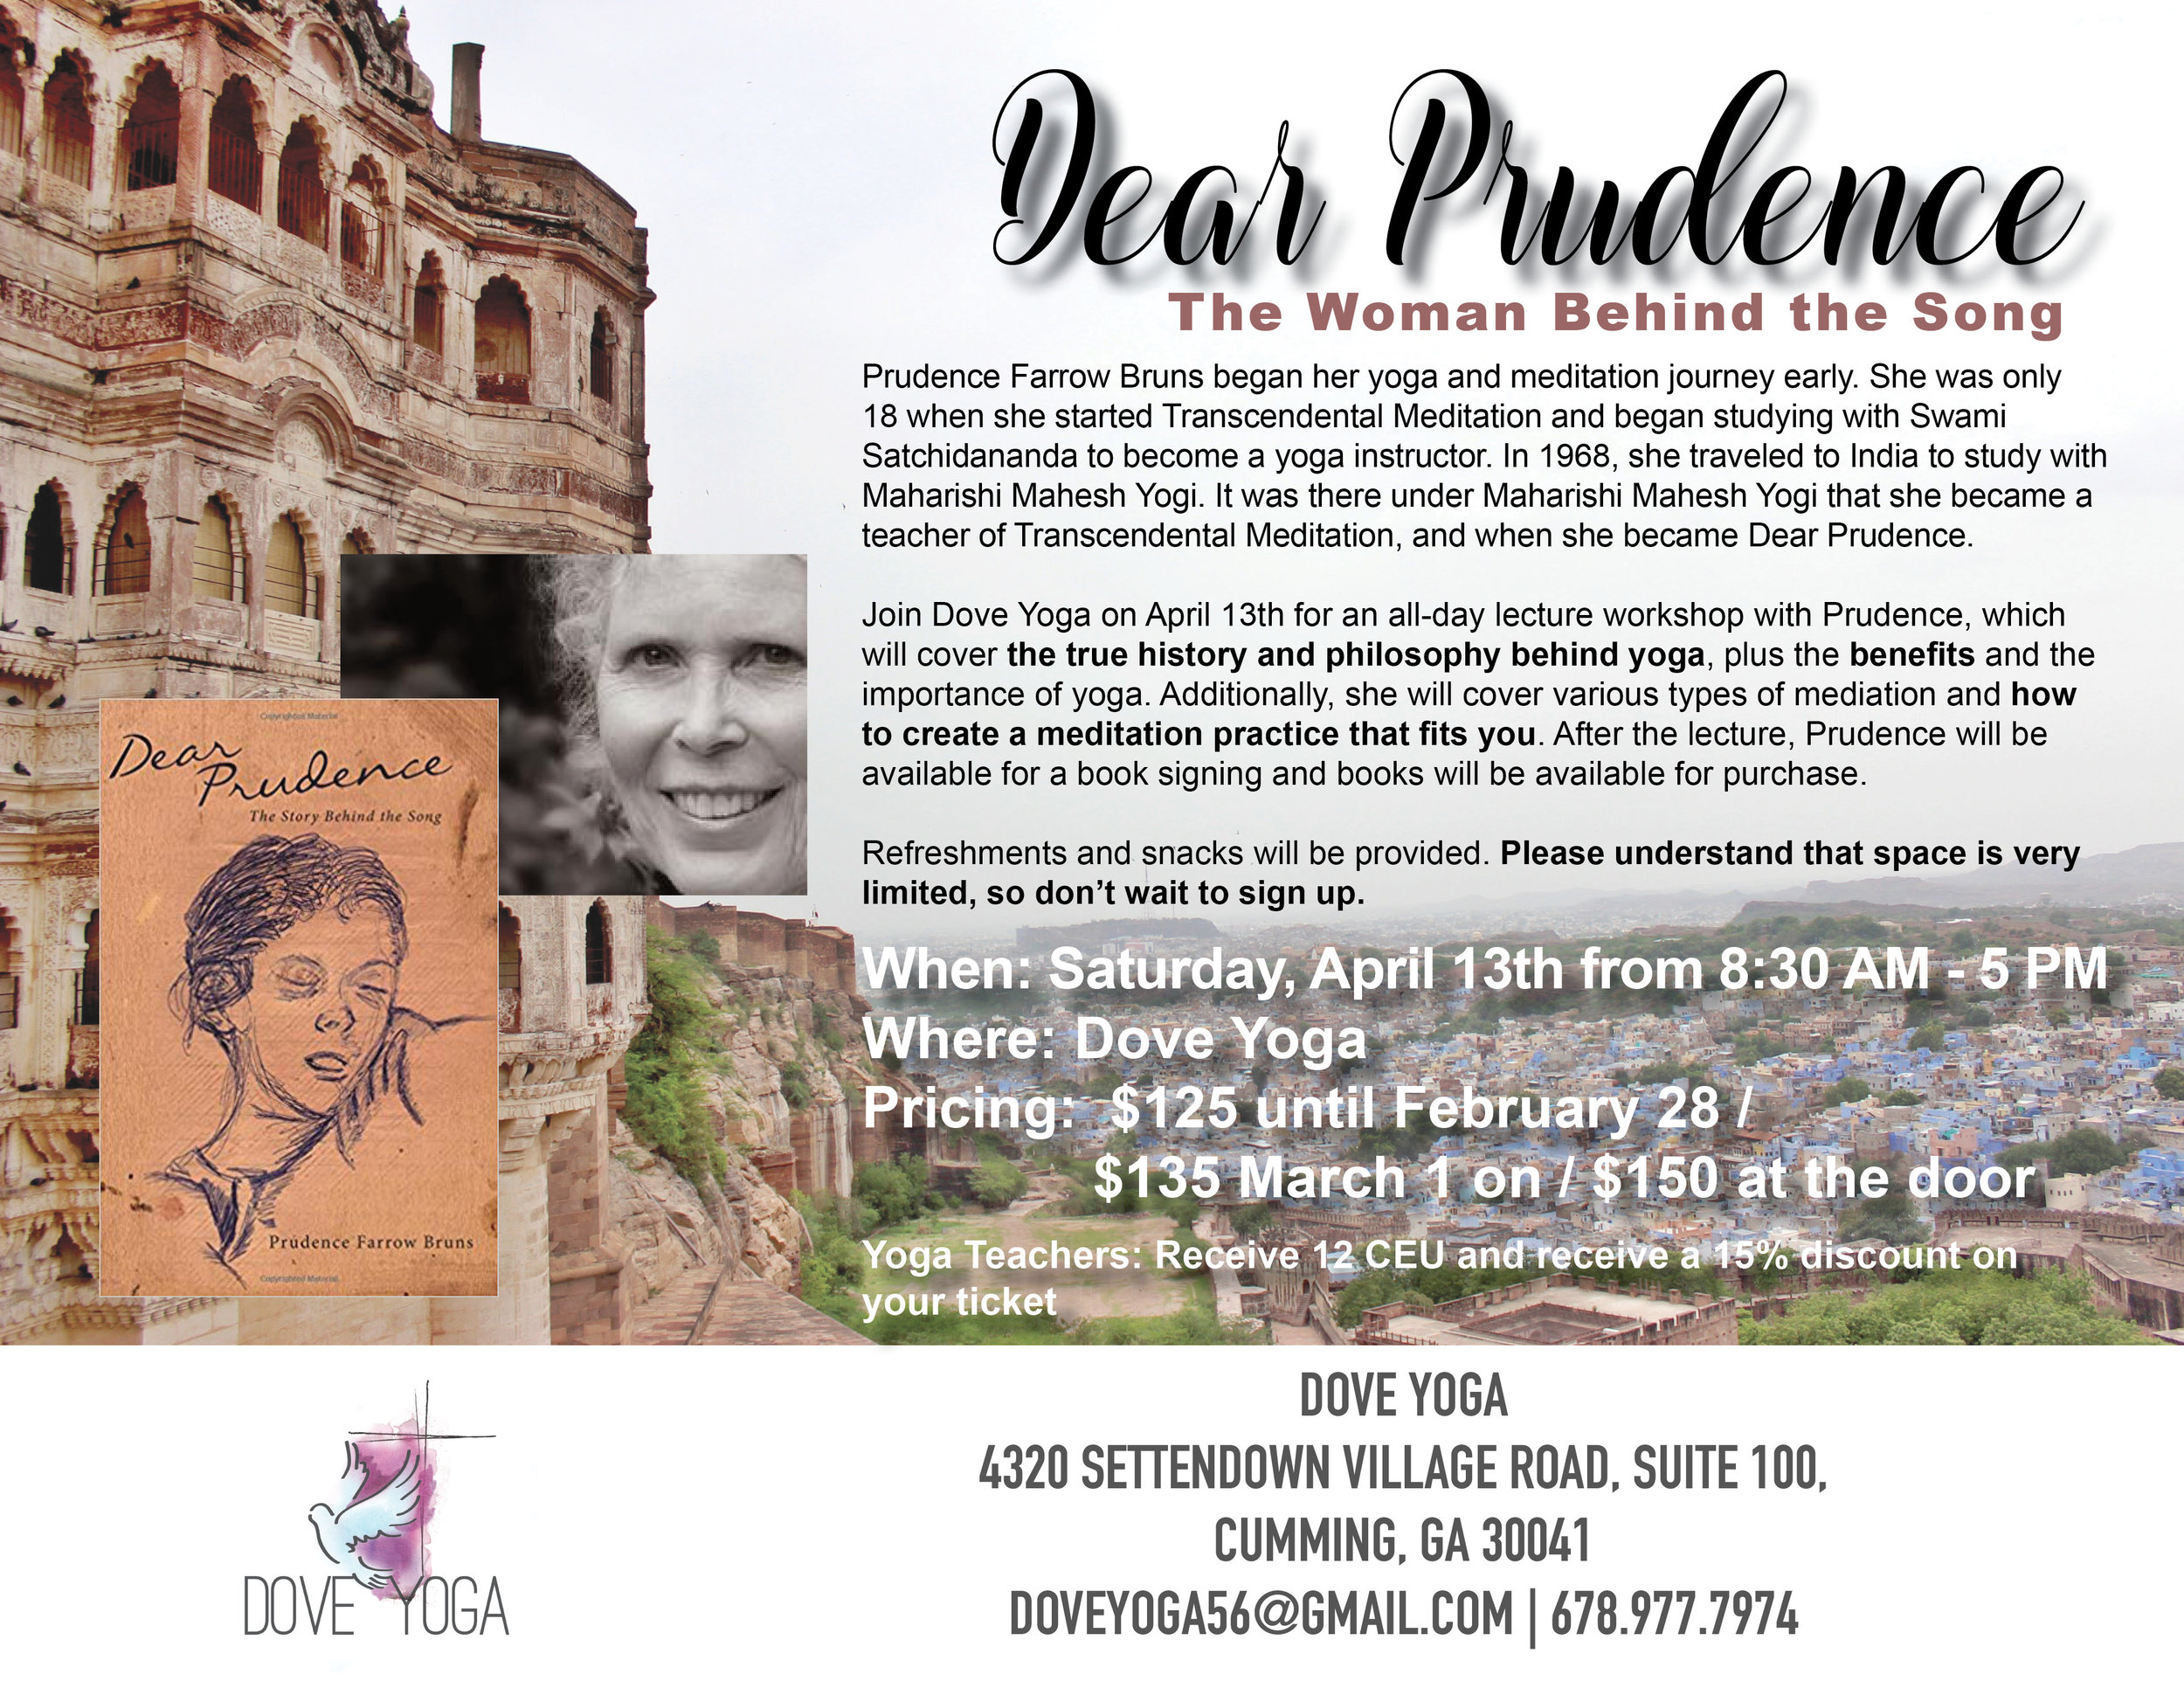 PrudenceBurnsBB2.jpg